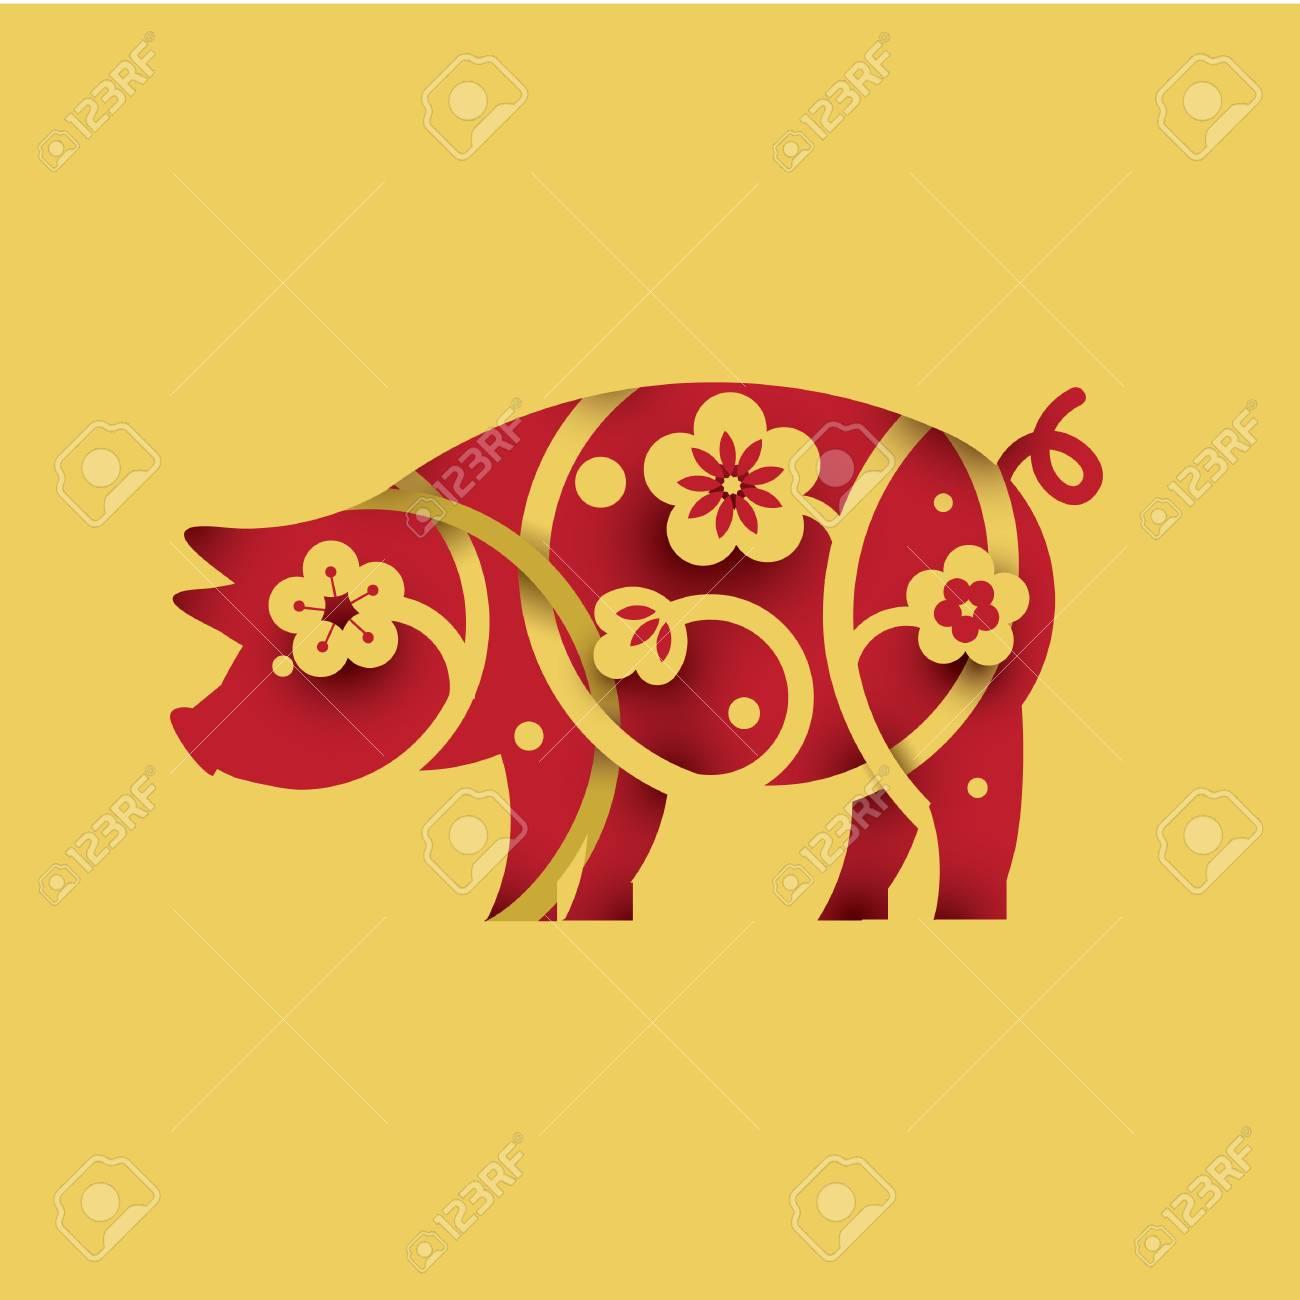 Pig. Symbol of 2019. Paper cut style. - 110158001